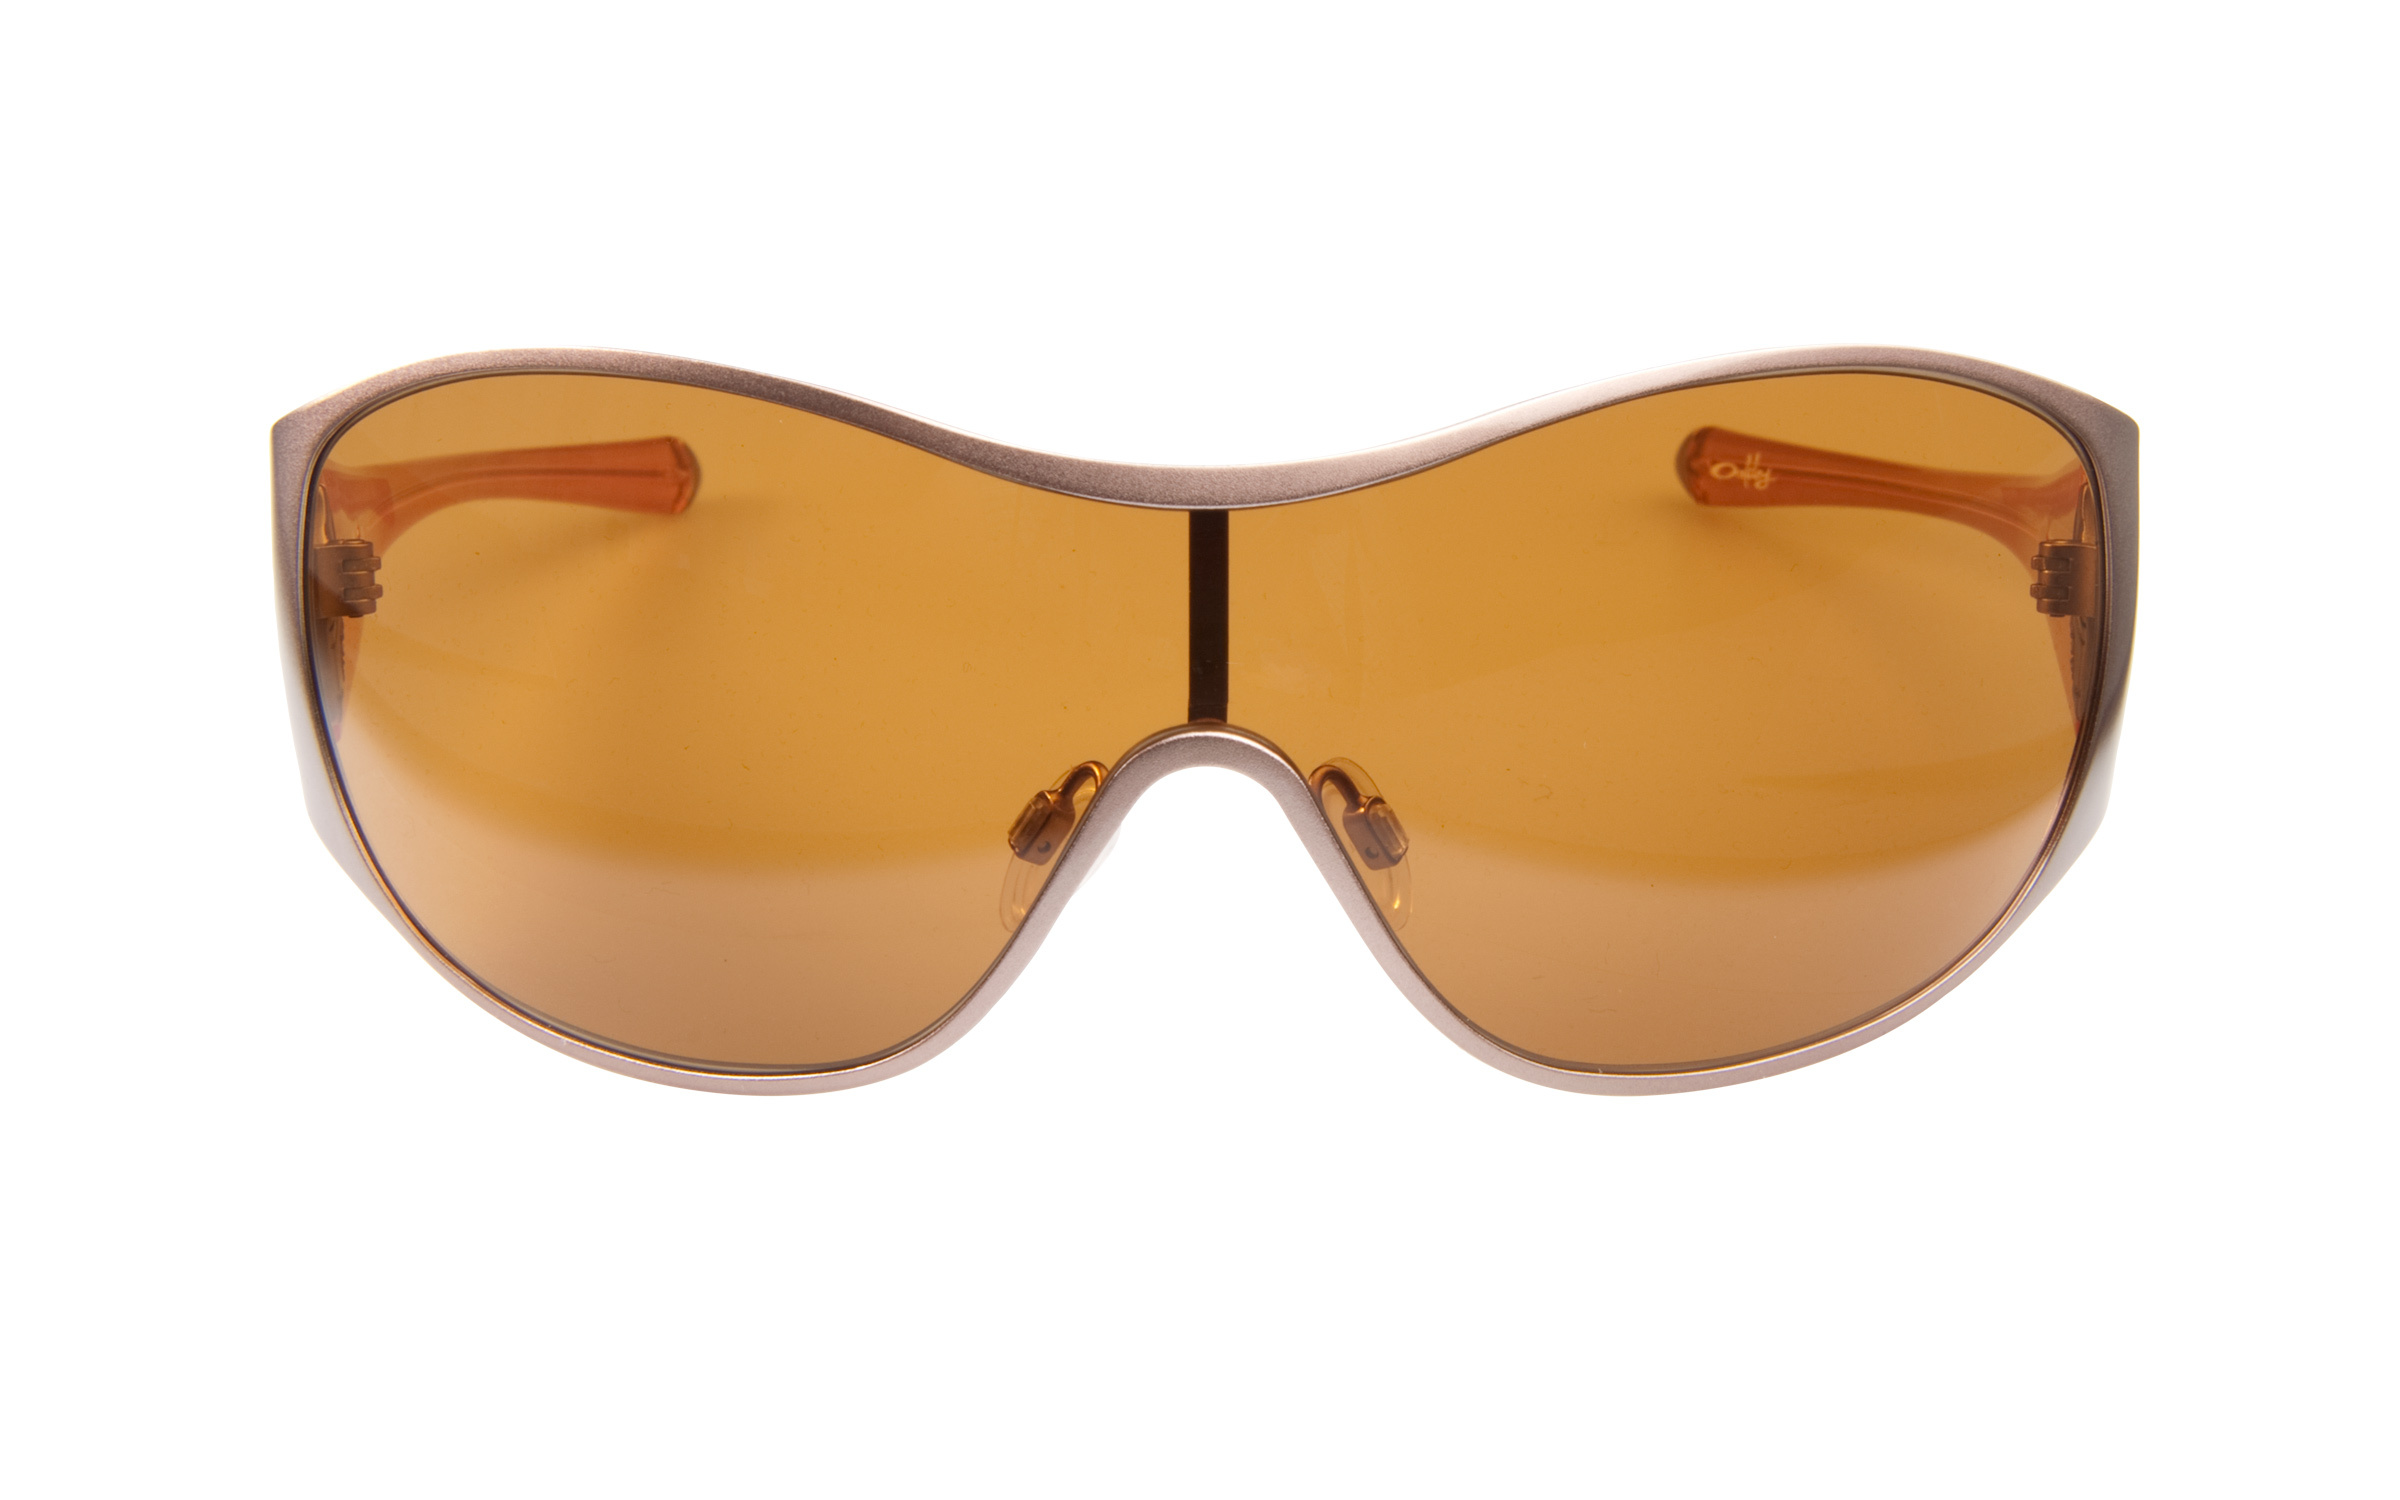 Oakley_Sunglasses_Purple_Acetate_Online_Coastal